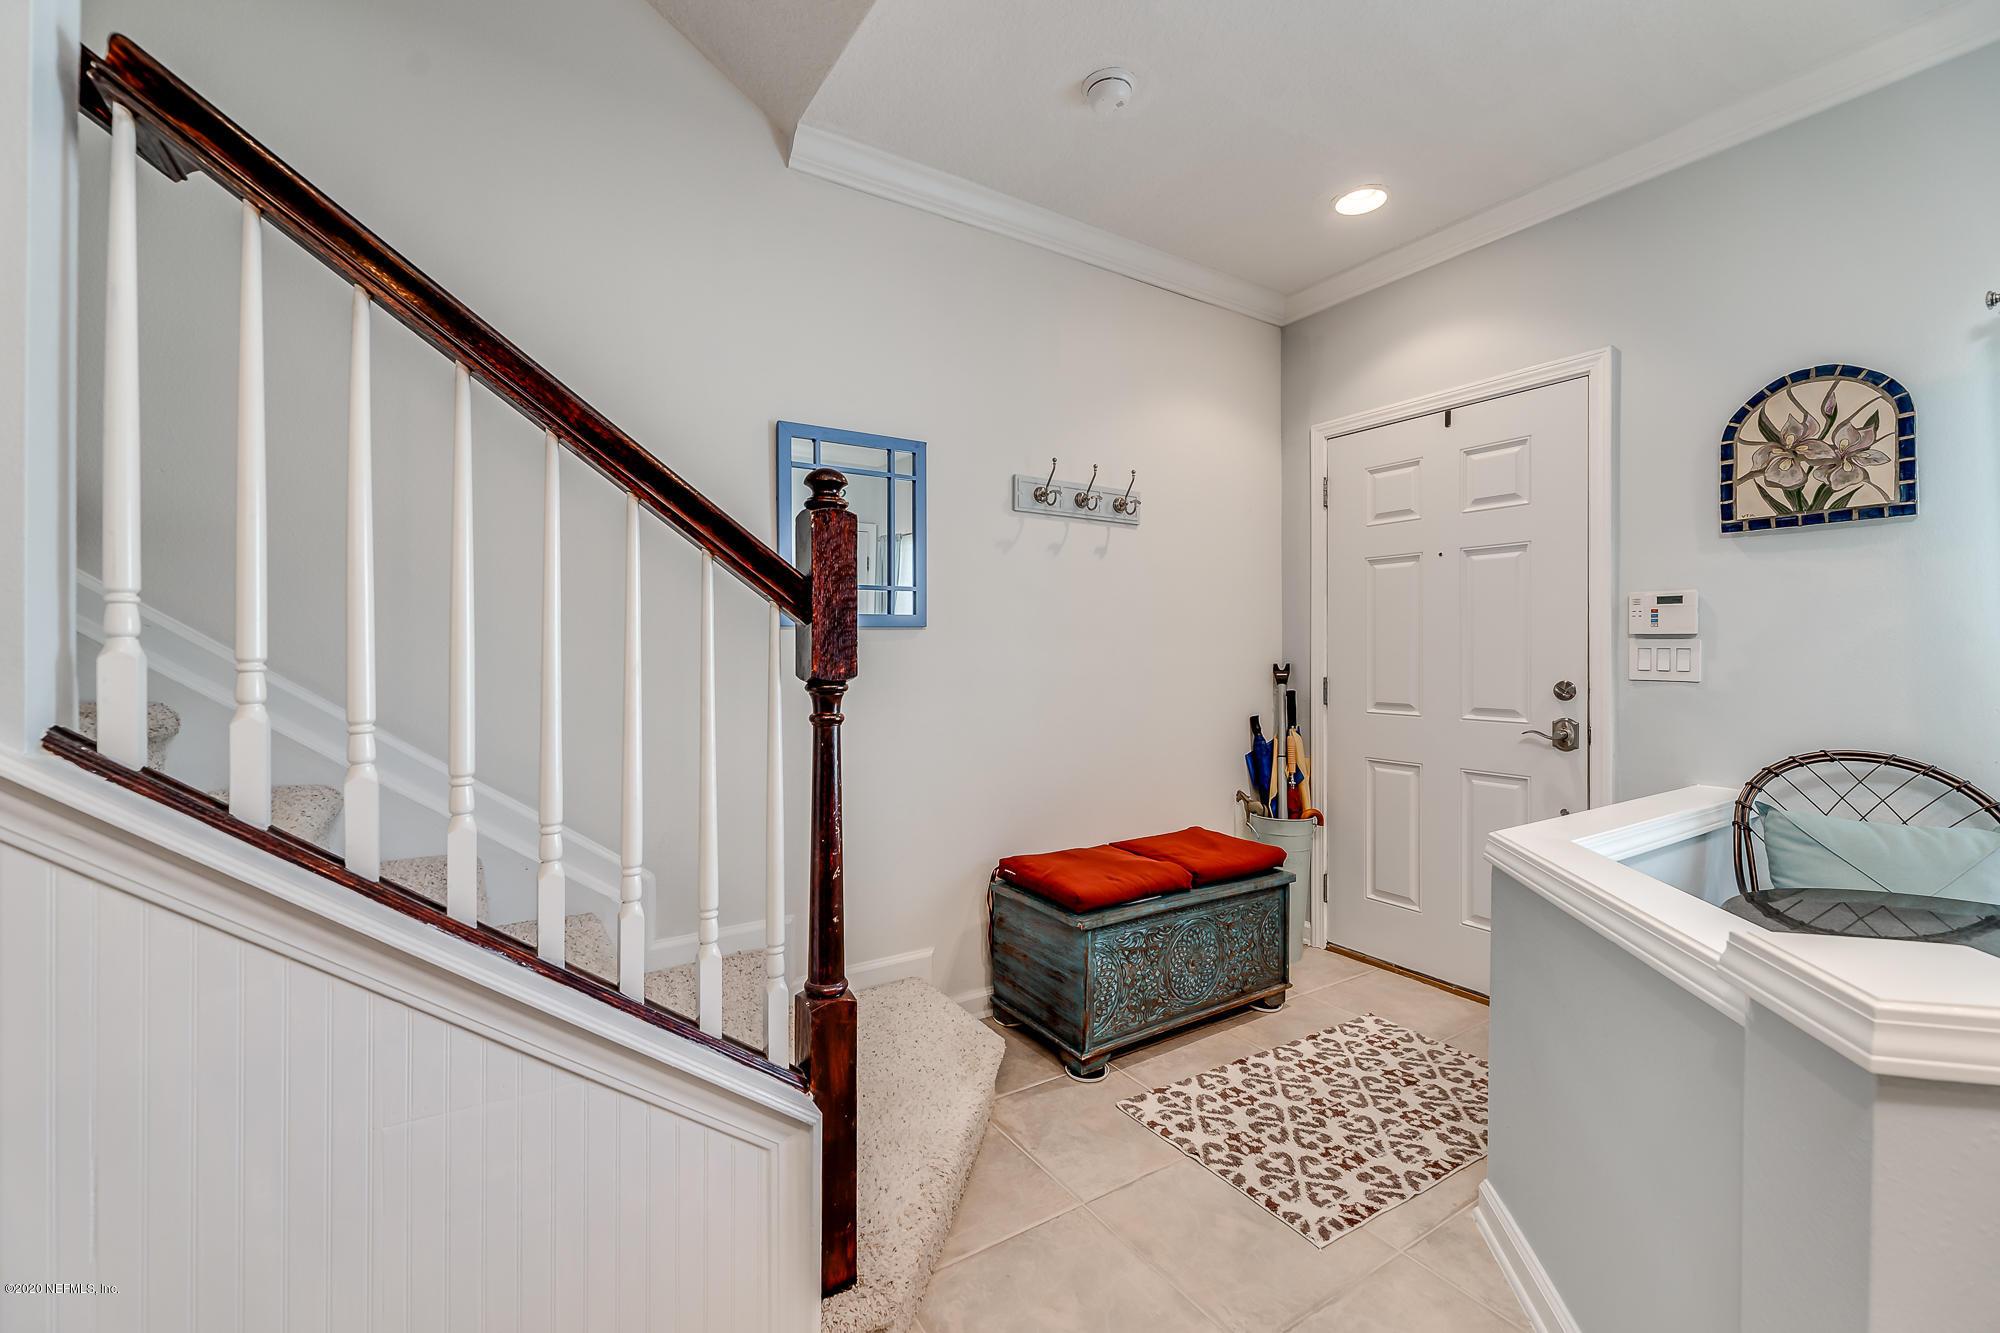 8141 SUMMERSIDE, JACKSONVILLE, FLORIDA 32256, 2 Bedrooms Bedrooms, ,2 BathroomsBathrooms,Residential,For sale,SUMMERSIDE,1081574